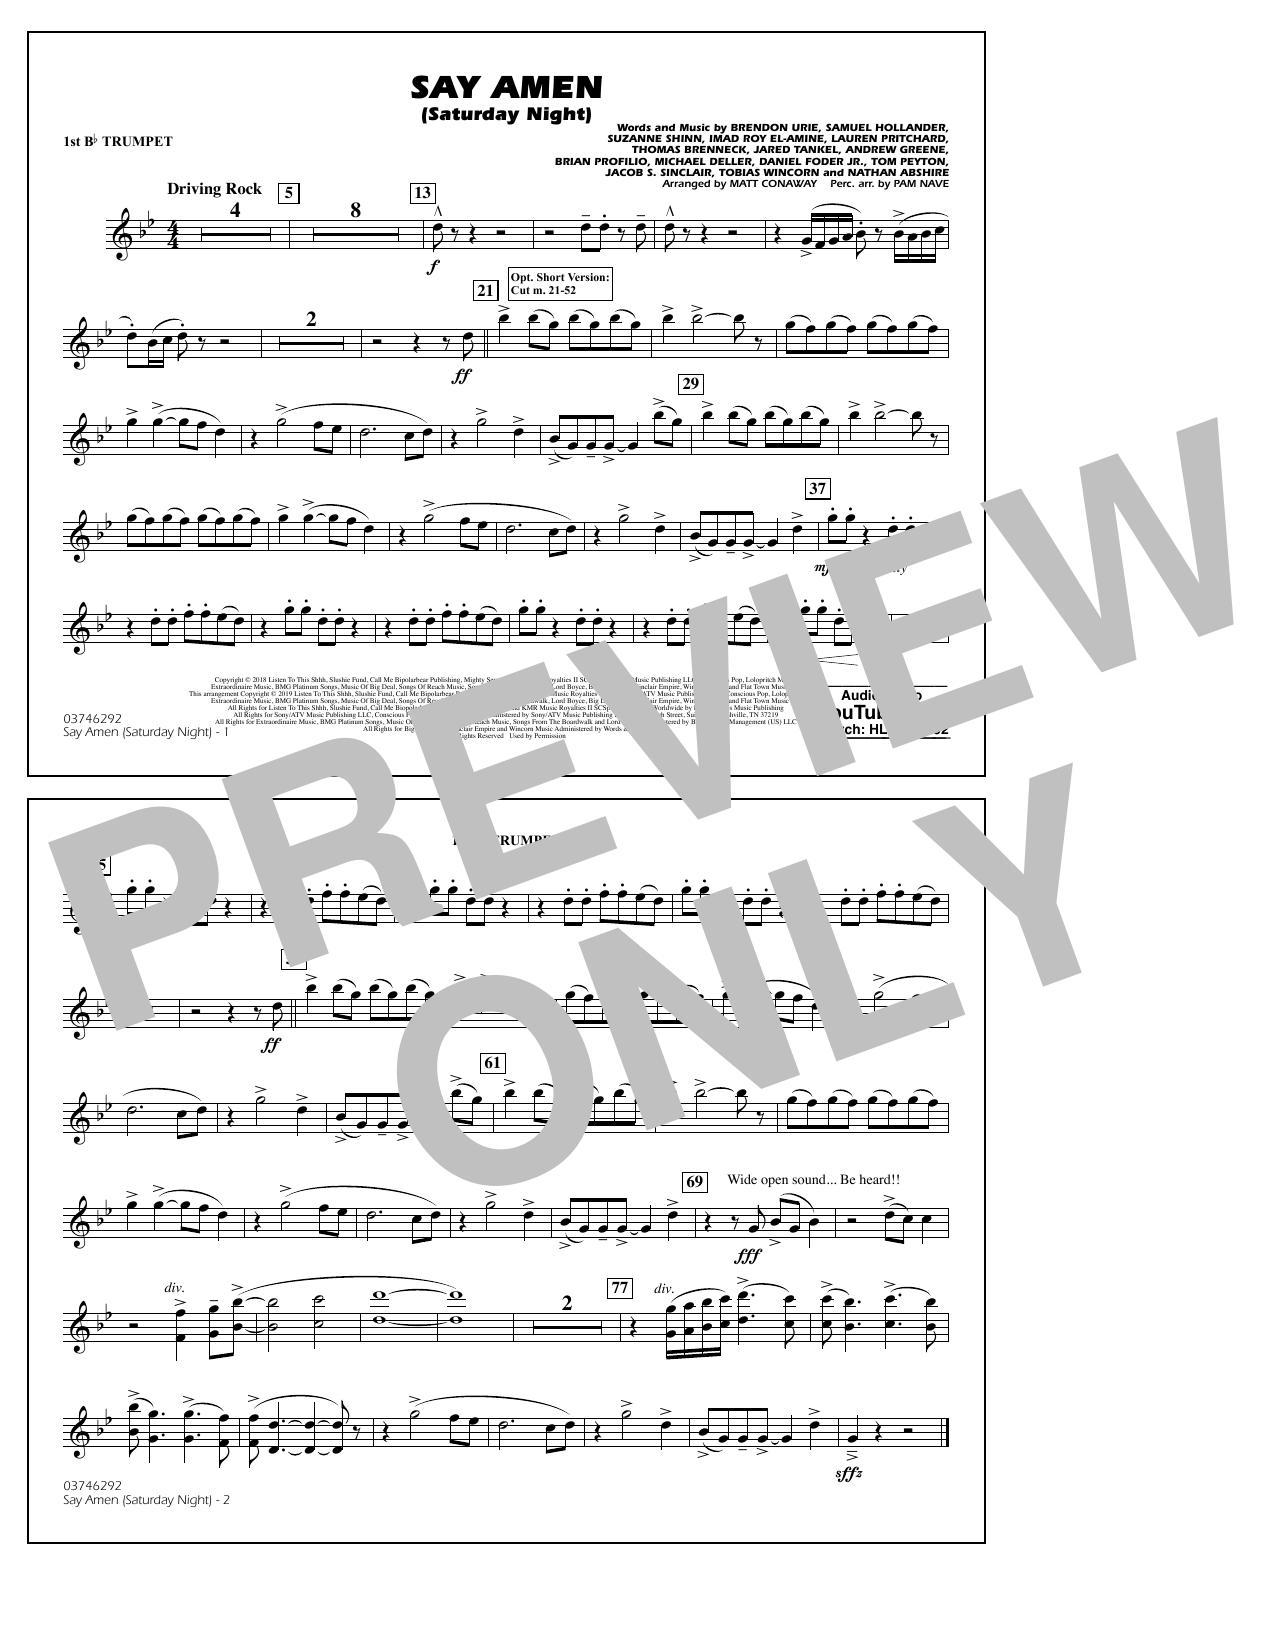 Panic At The Disco Say Amen Saturday Night arr. Matt Conaway   15st Bb  Trumpet Sheet Music Notes, Chords   Download Printable Marching Band PDF ...